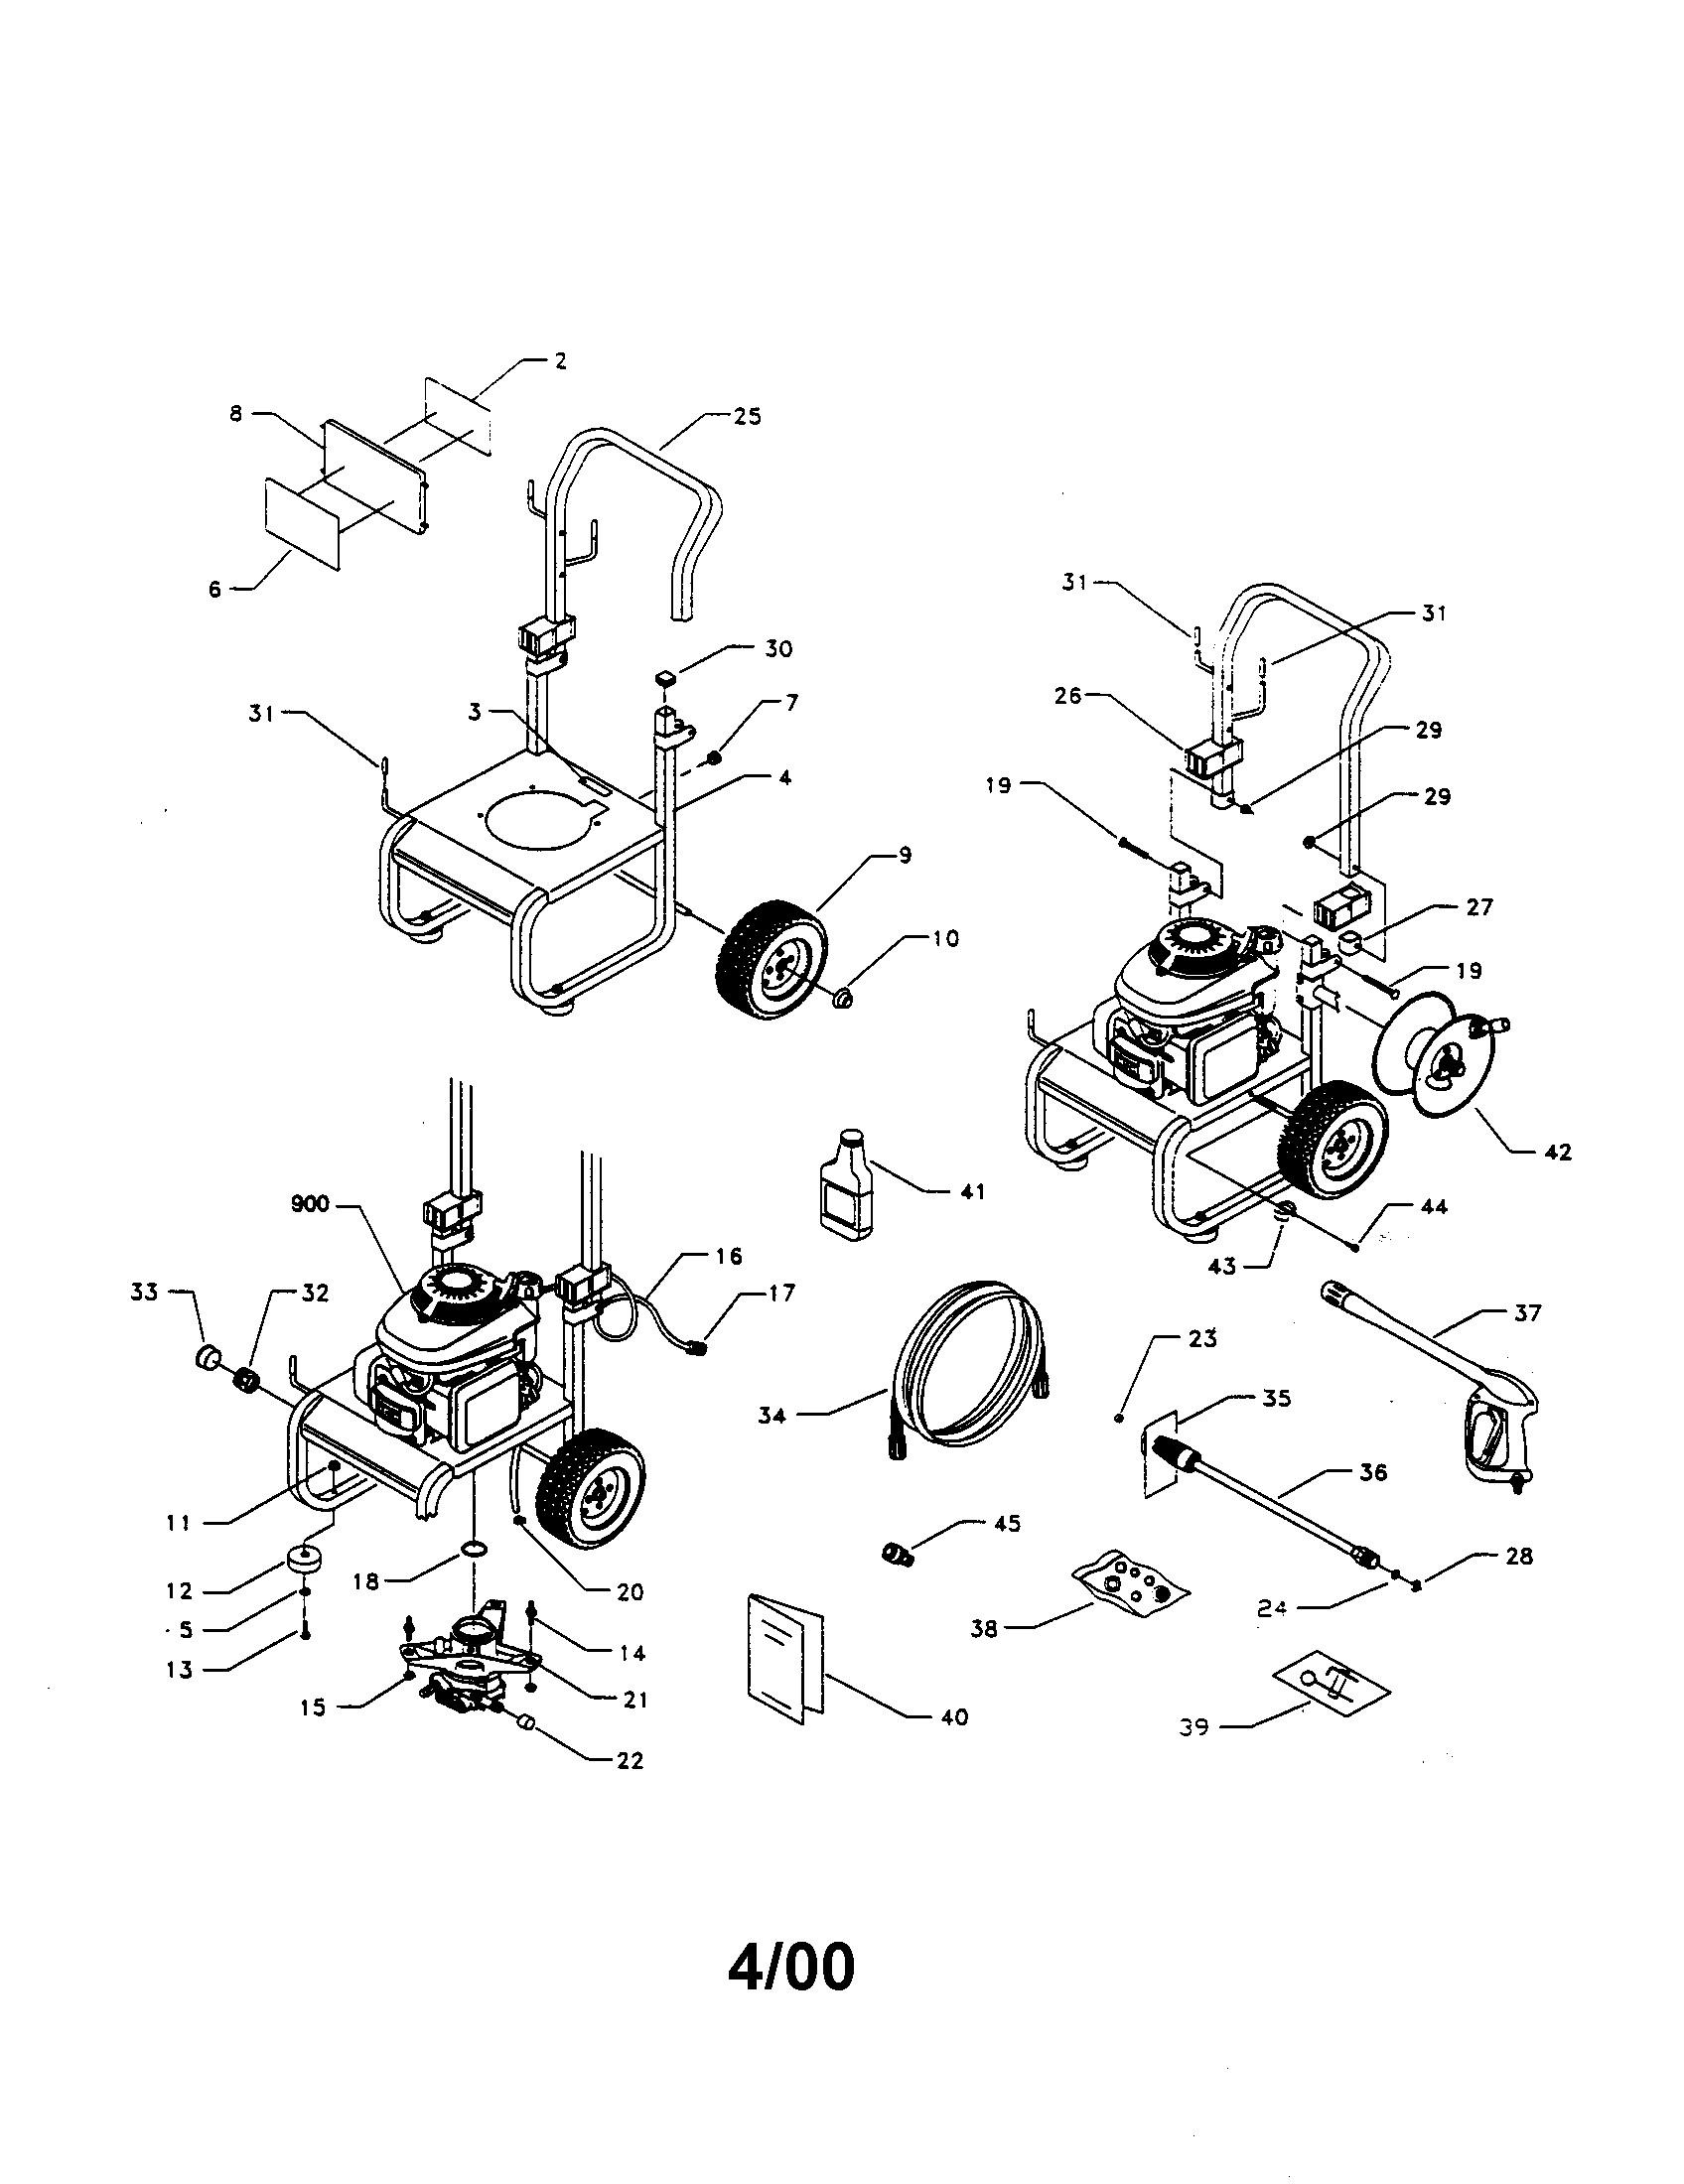 Honda Pressure Washer Manual